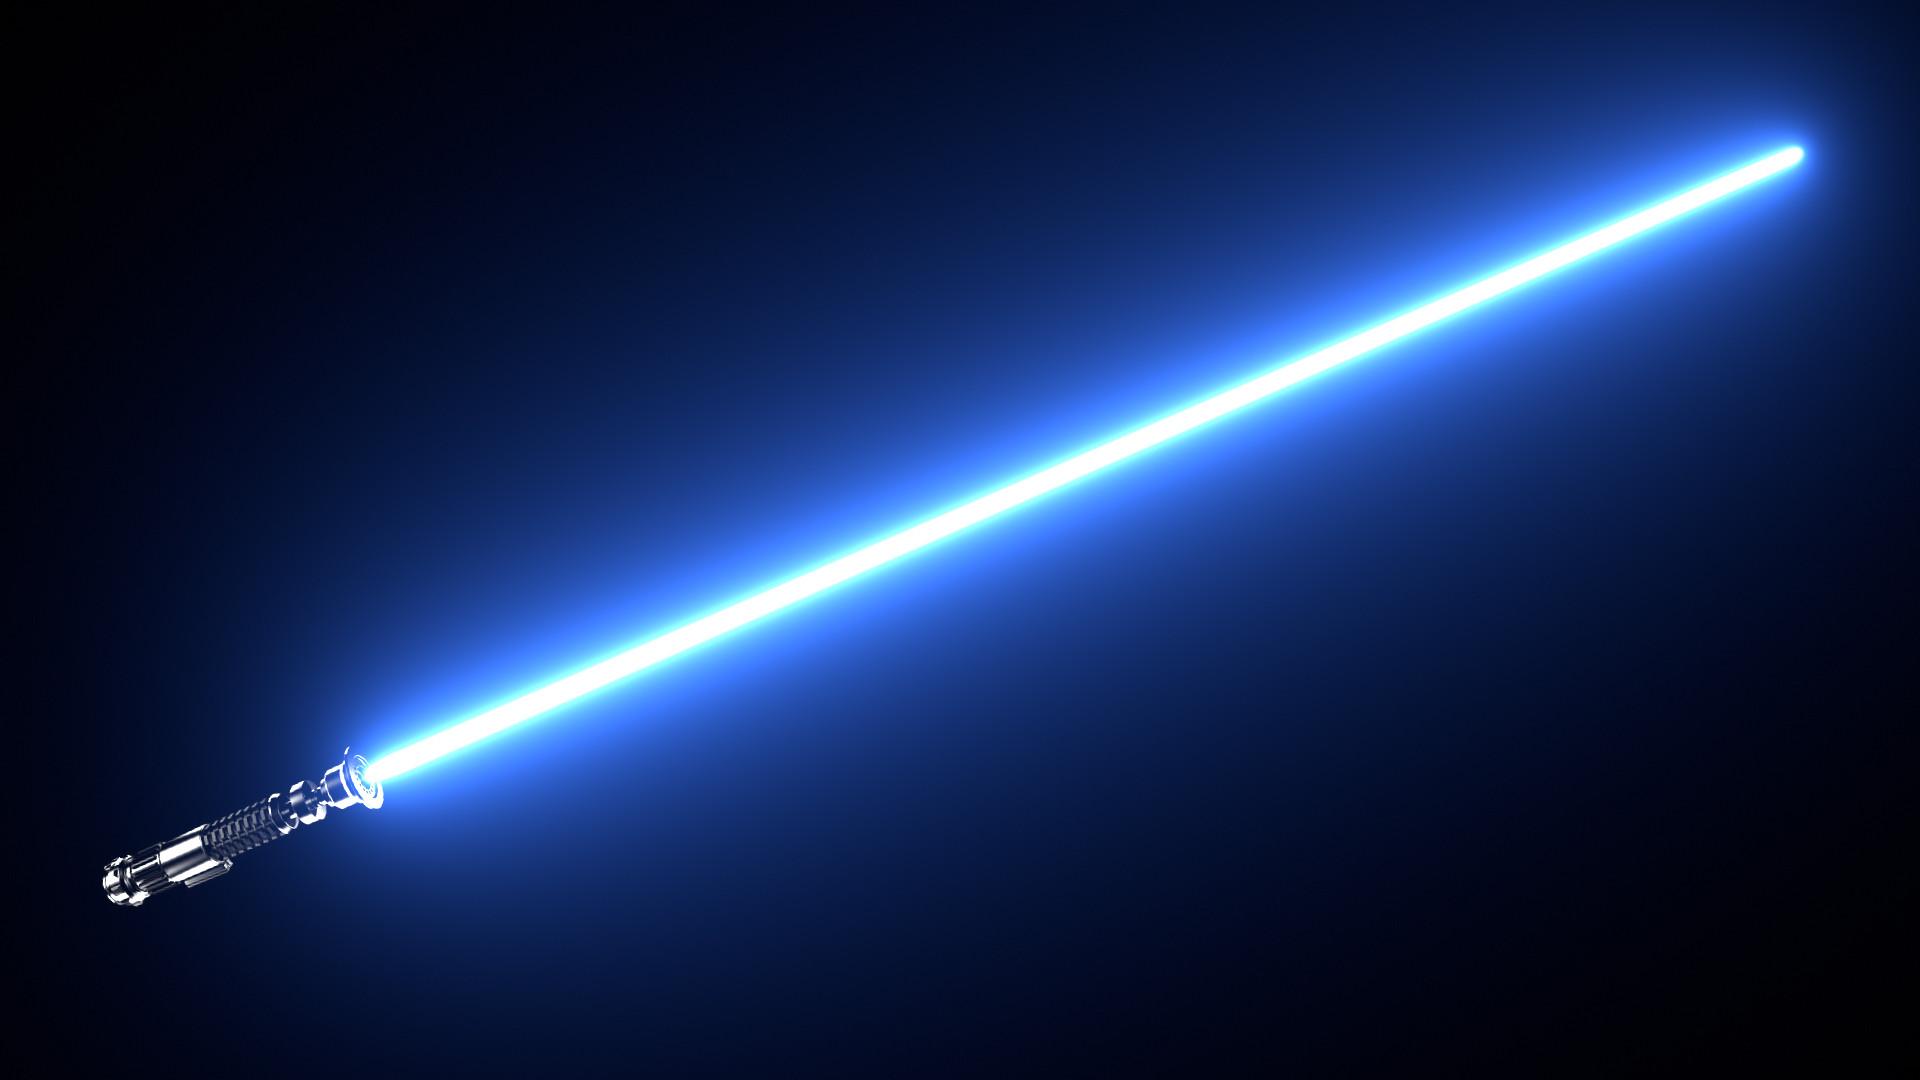 free photo light effect light lines glow free download jooinn